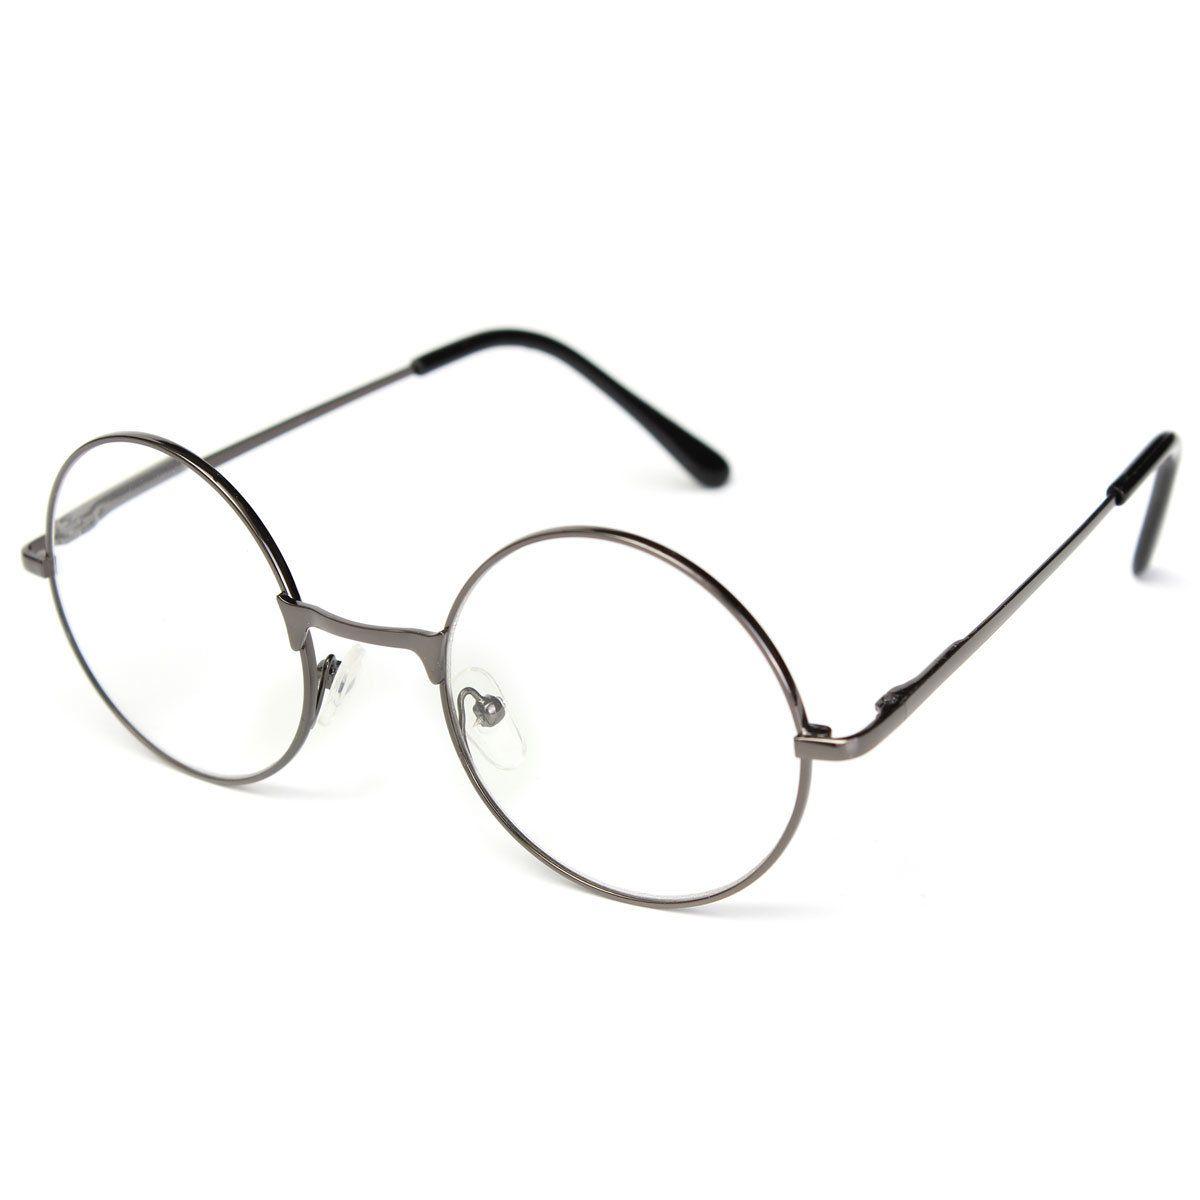 unisex men women resin round oval metal rim presbyopic reading glasses